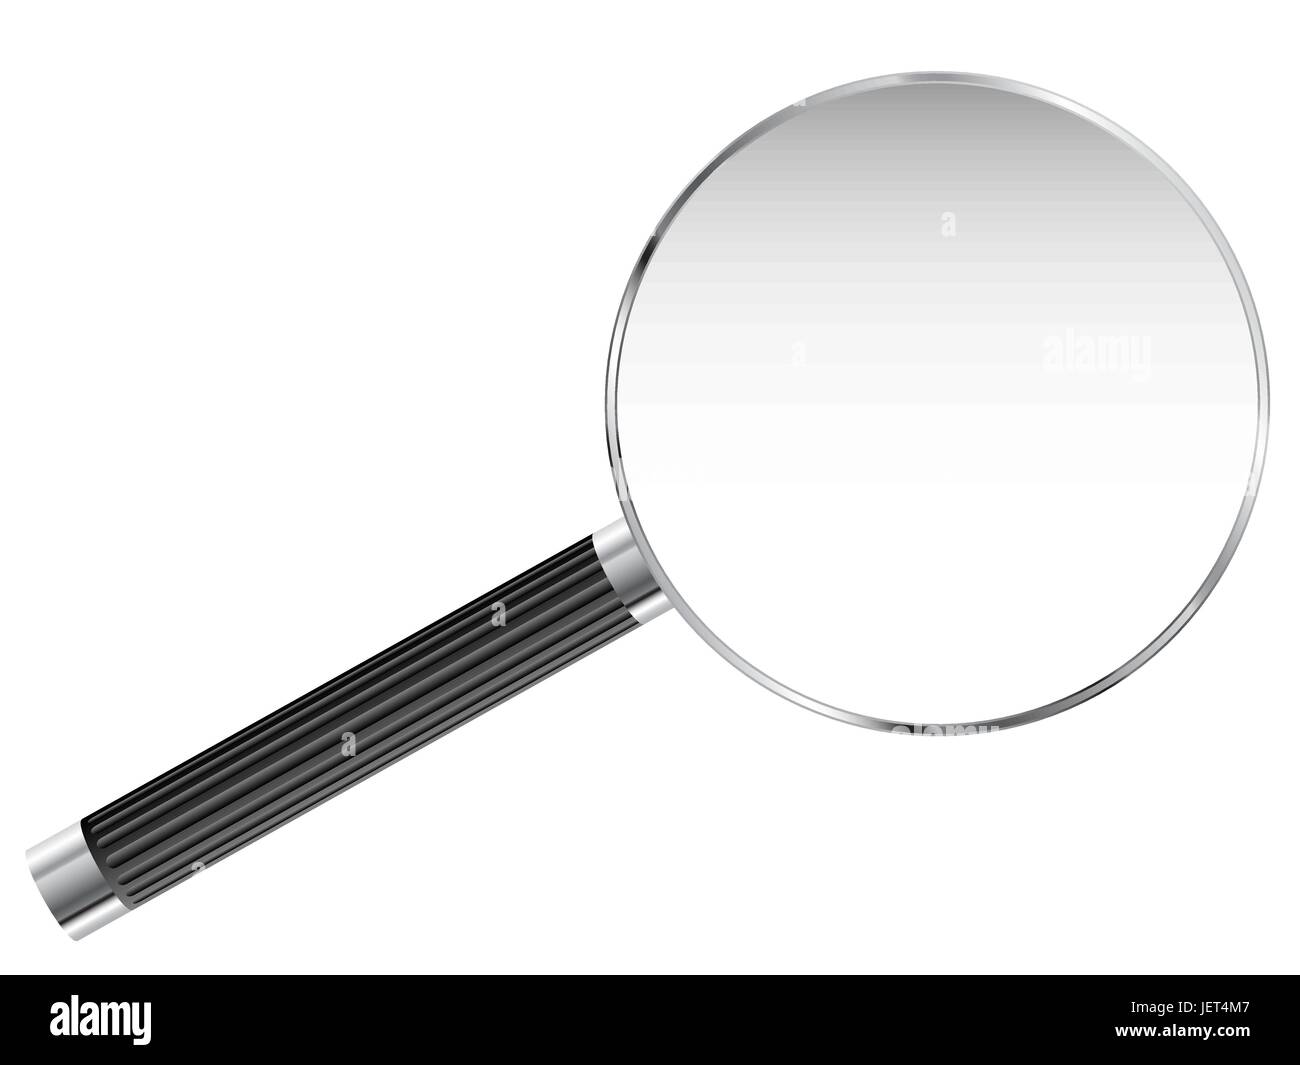 glass, chalice, tumbler, spy, magnify, secret, hidden, enlarged, magnifying, - Stock Vector